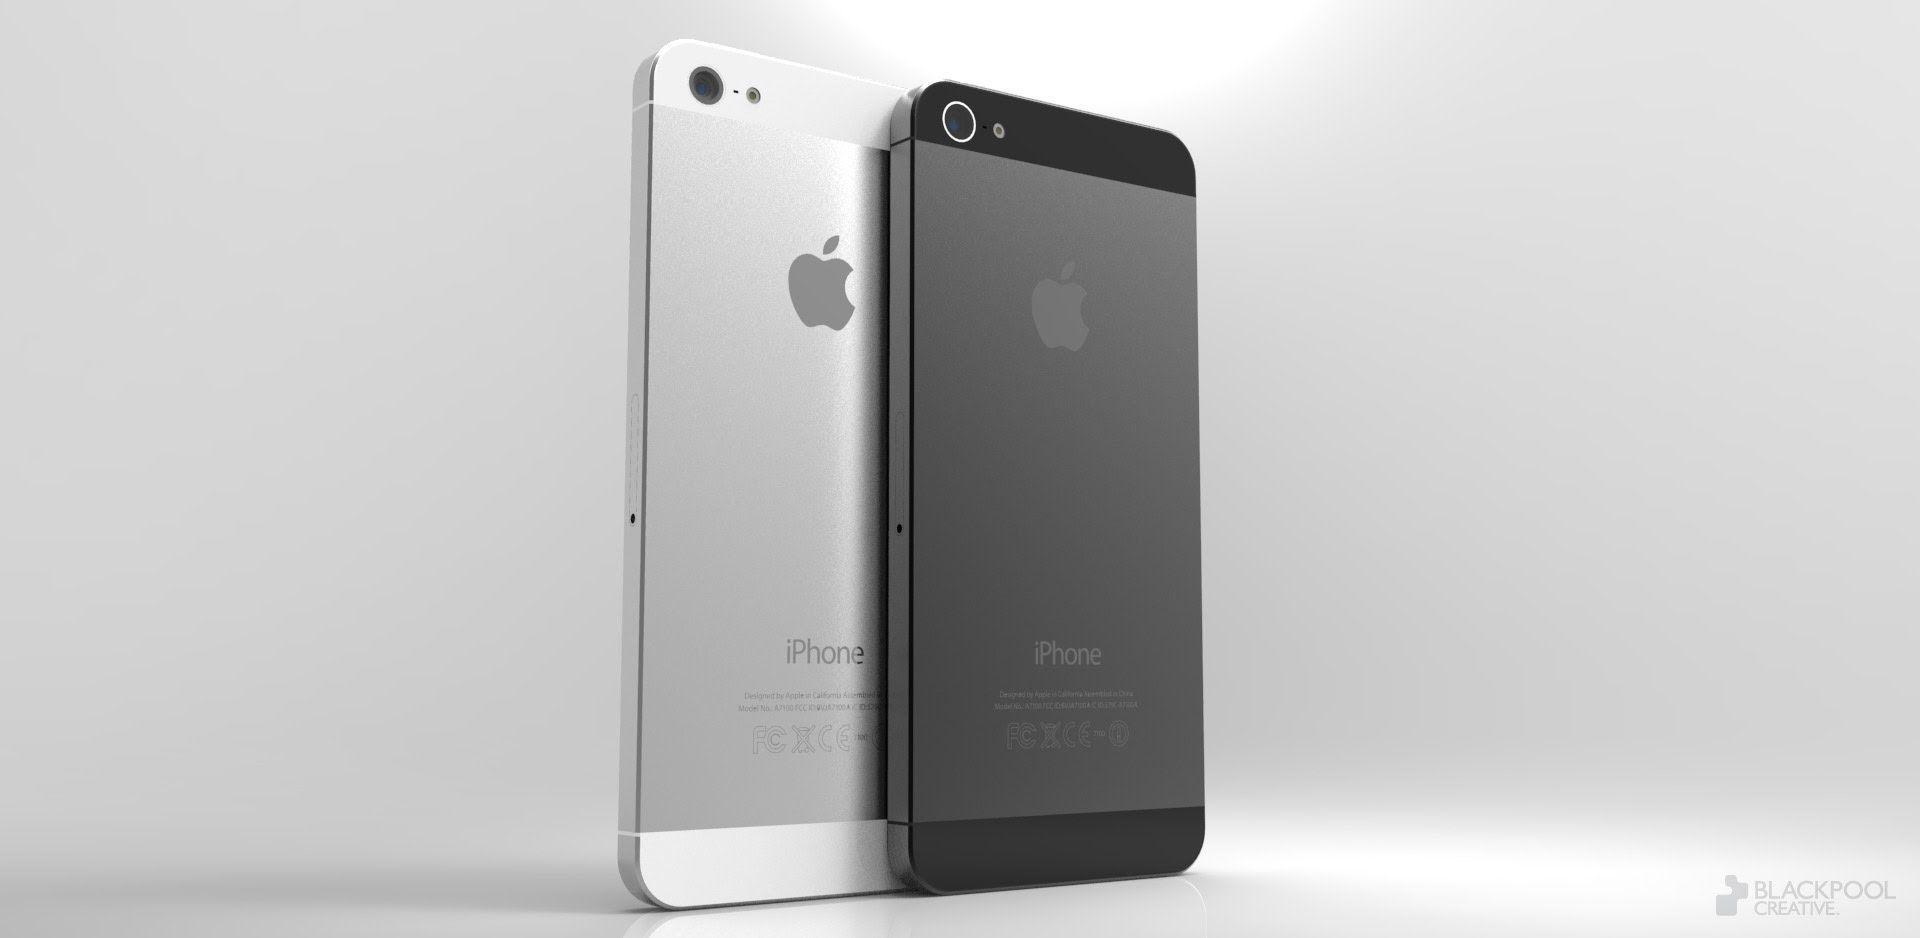 Iphone 5 は9月21日発売 予想画像 発売日 機能 スペックまとめ